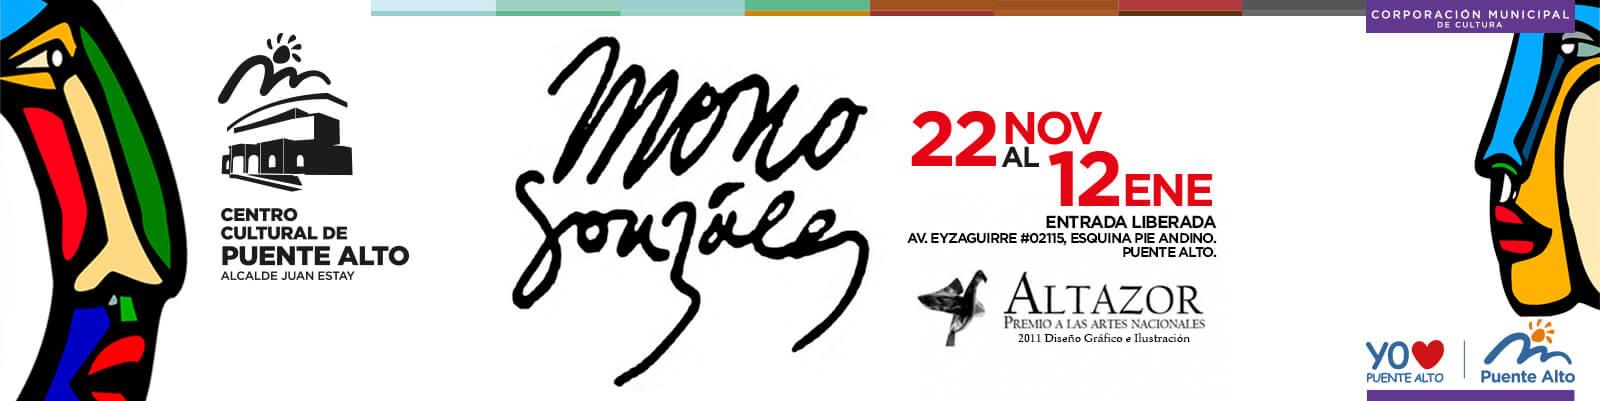 Exposición de xilografías del muralista Mono González.